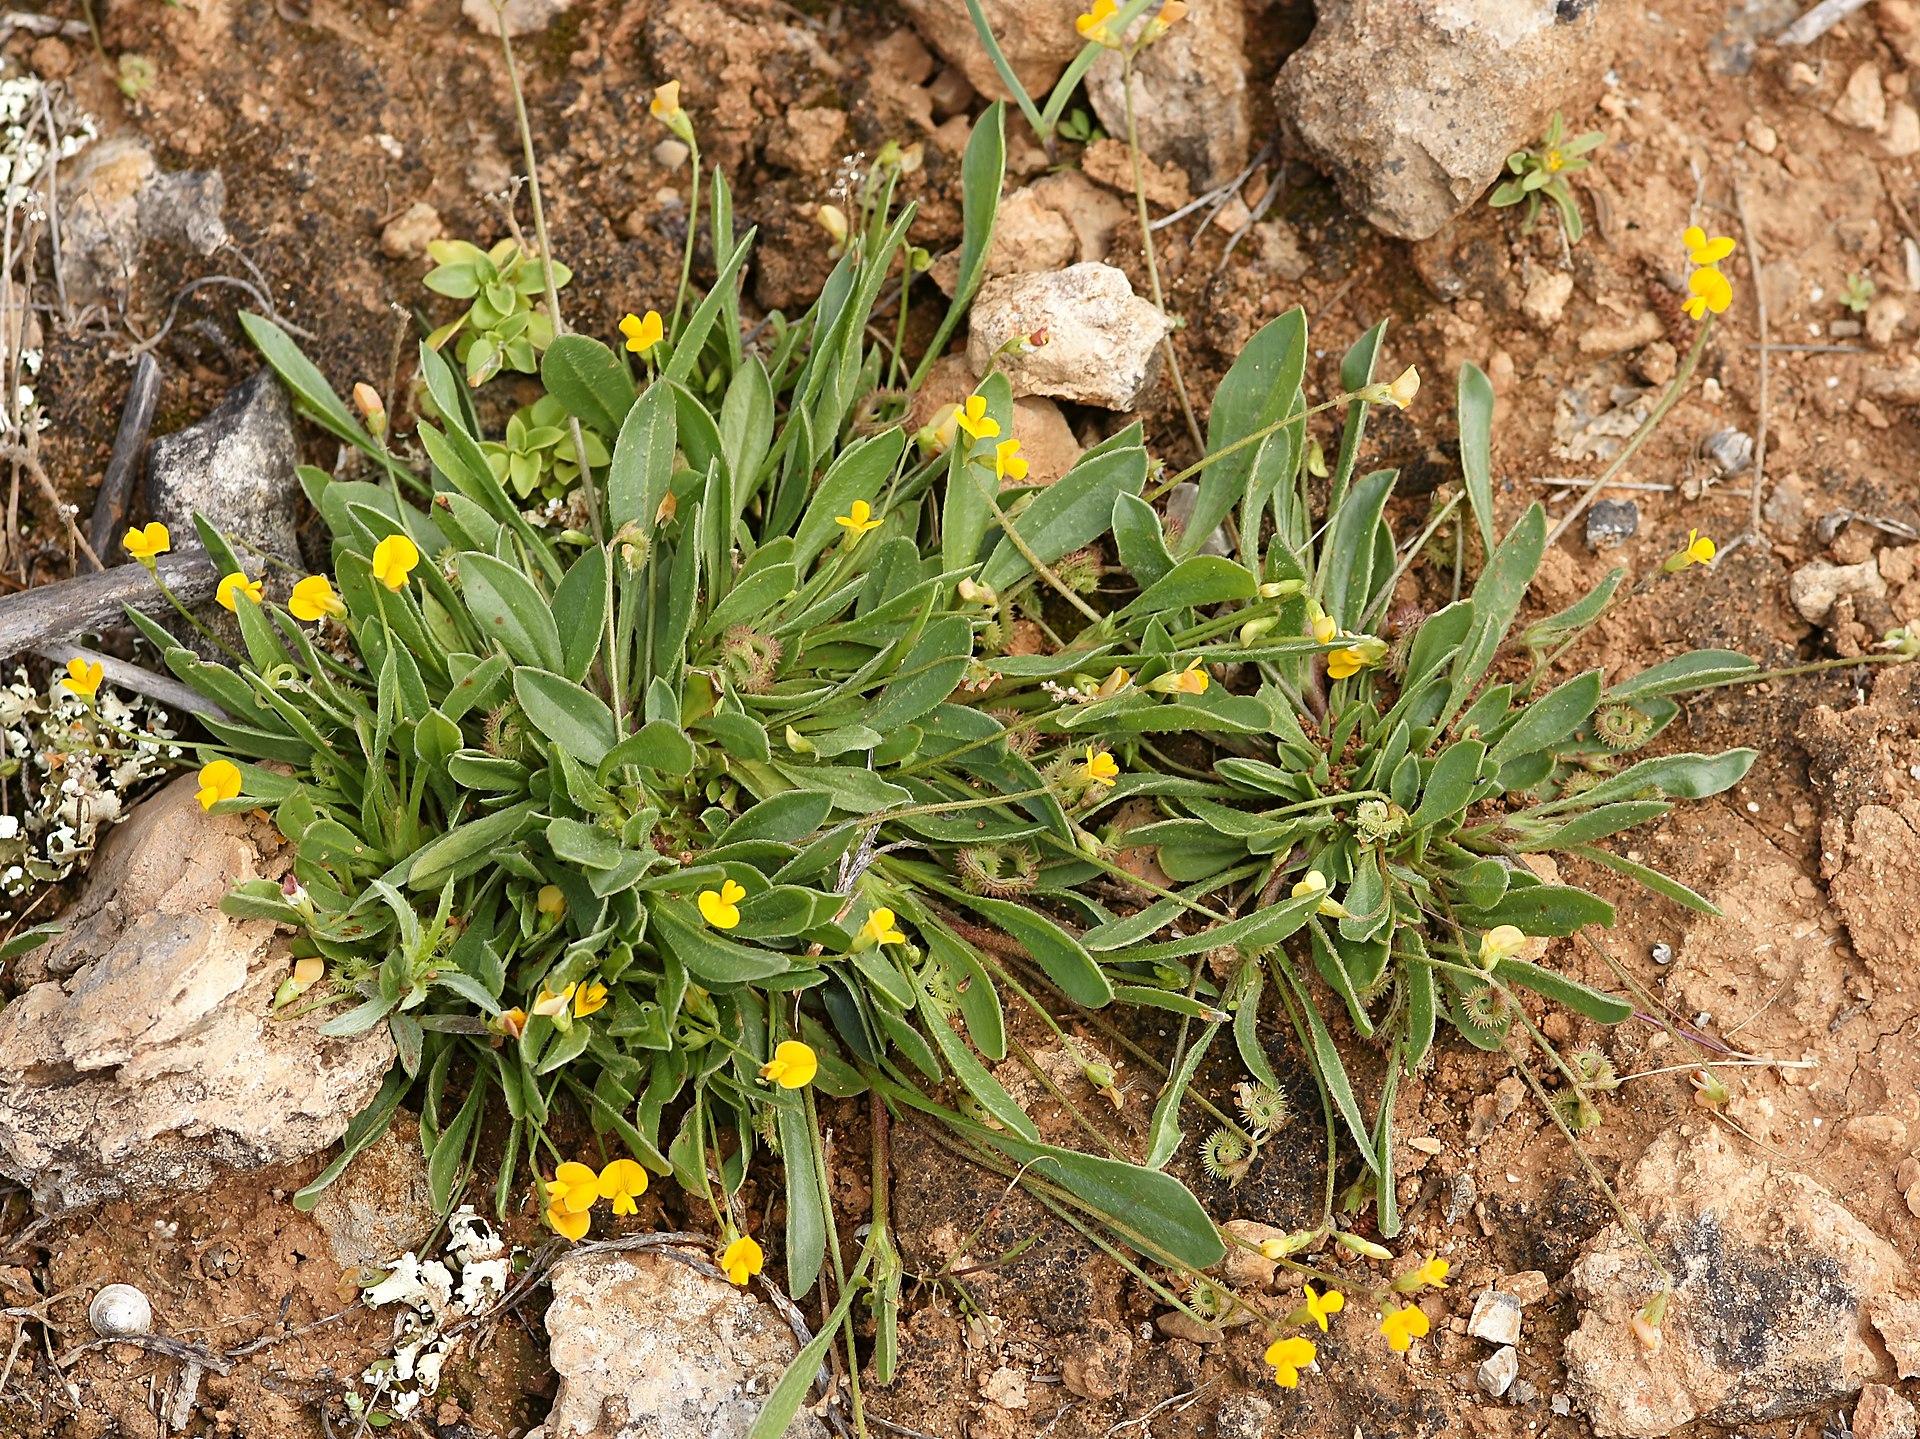 Scorpiurus muricatus L.  English: Prickly Caterpillar near Cala Ses Salinas, Mallorca. Français : Pied de queue de scorpion. Photo prise près de la Cala Ses Salinas, à Majorque.